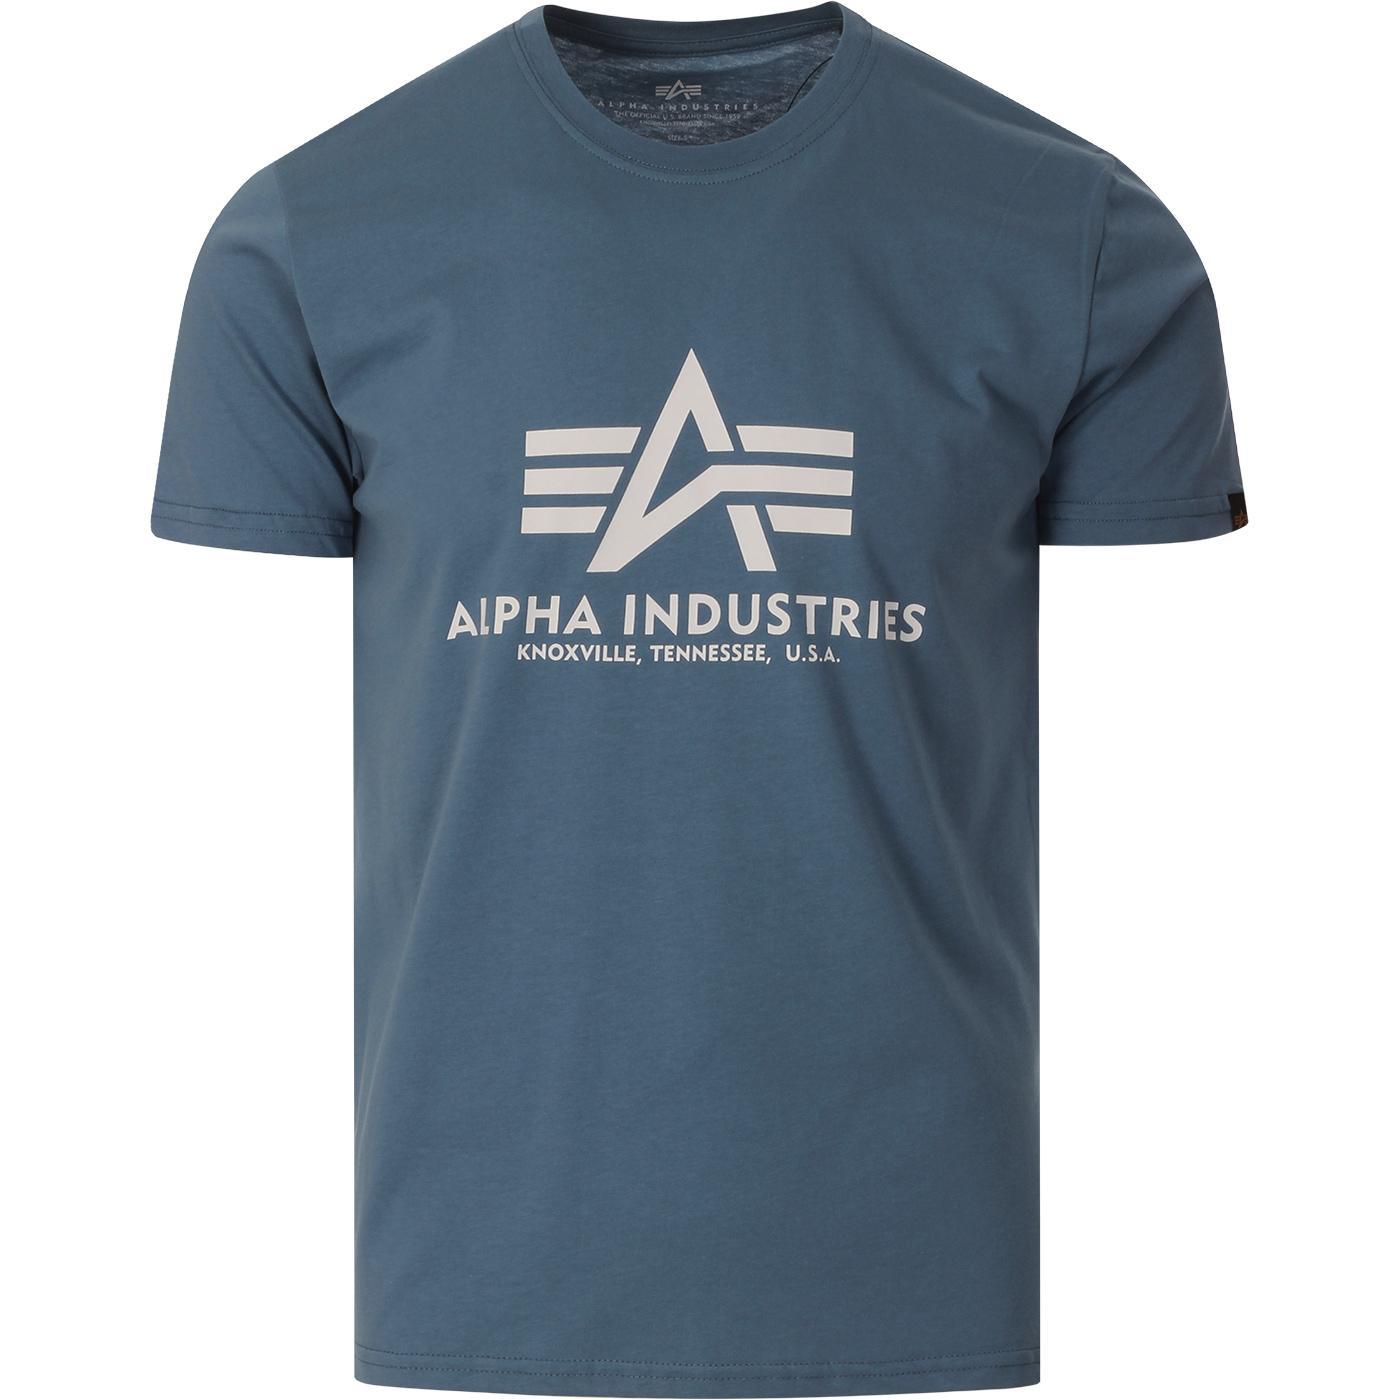 ALPHA INDUSTRIES Retro Logo Tee (Airforce Blue)